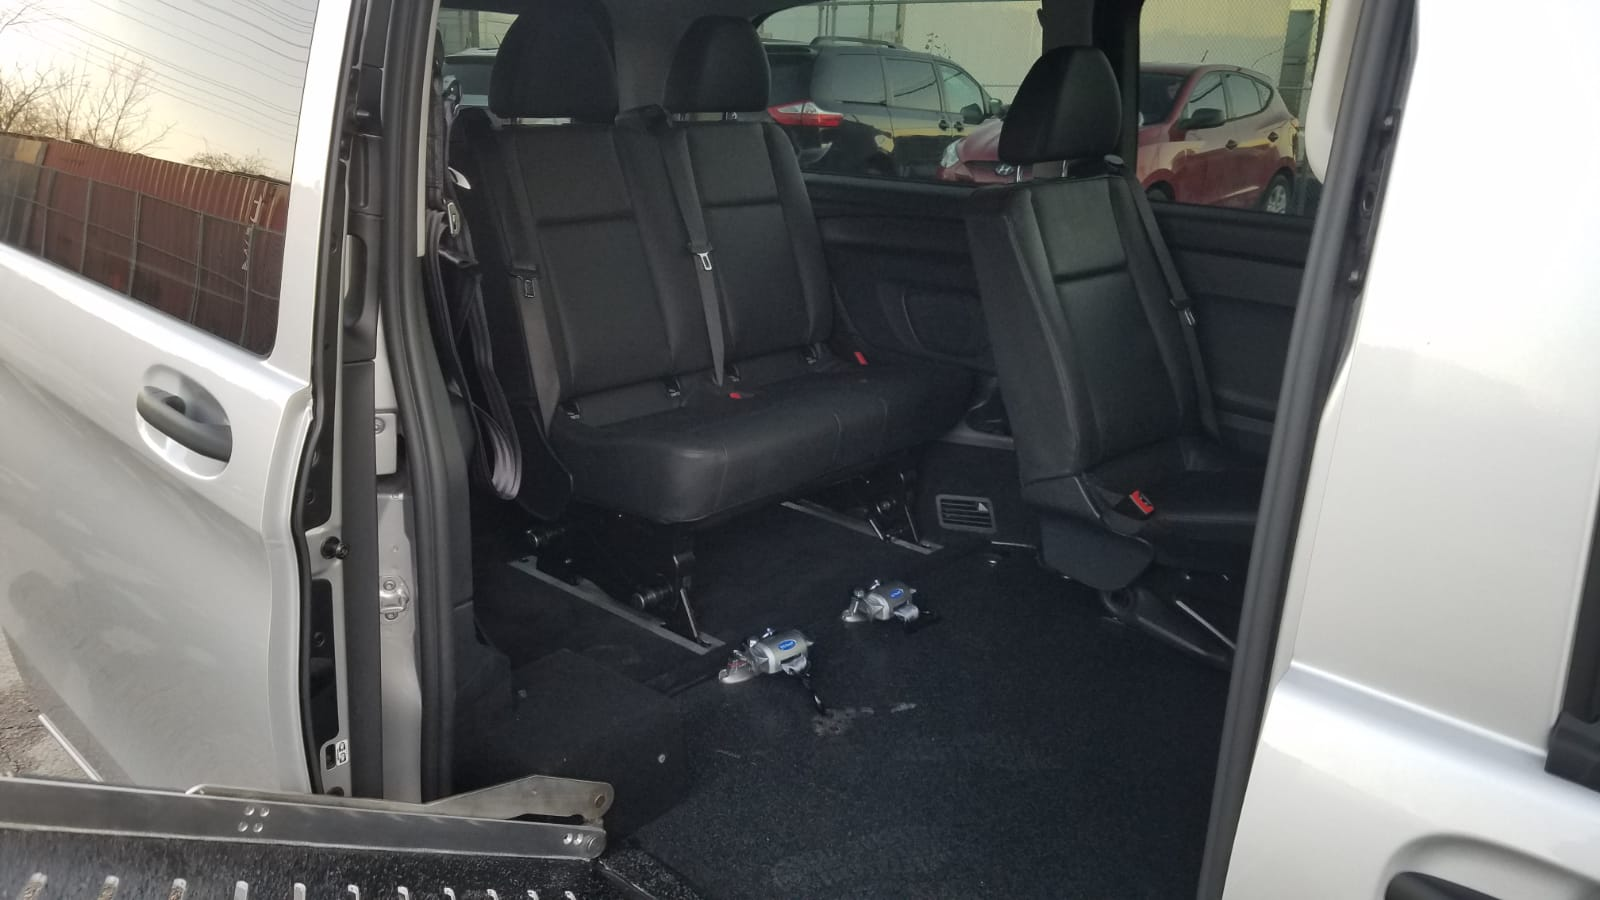 Interior ramp and seat view of 2020 Mercedes Metris